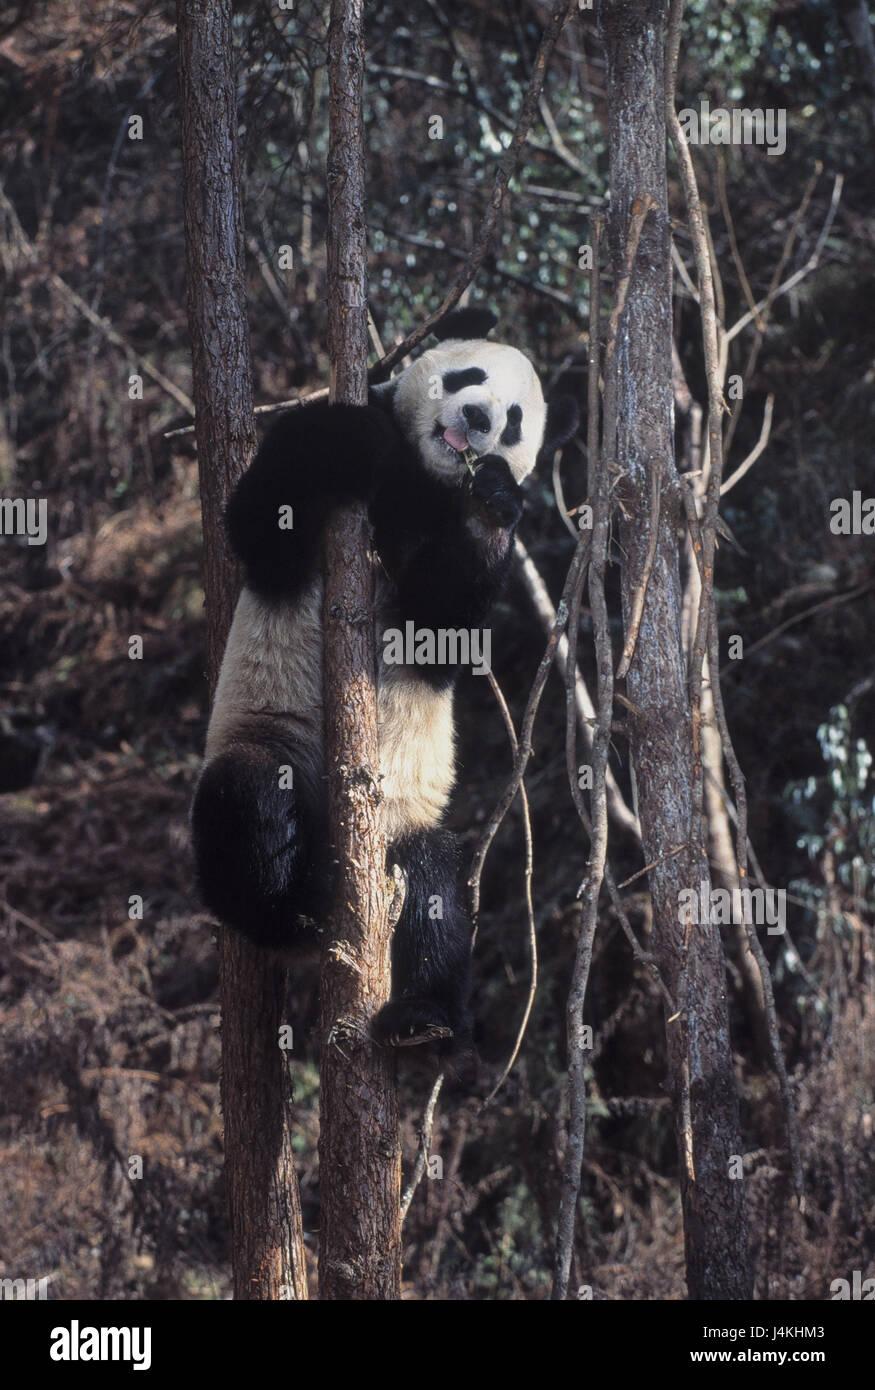 Wood, tree, big panda, Ailuropoda melanoleuca, ingestion animal world, wilderness, Wildlife, animals, animal, mammals, - Stock Image